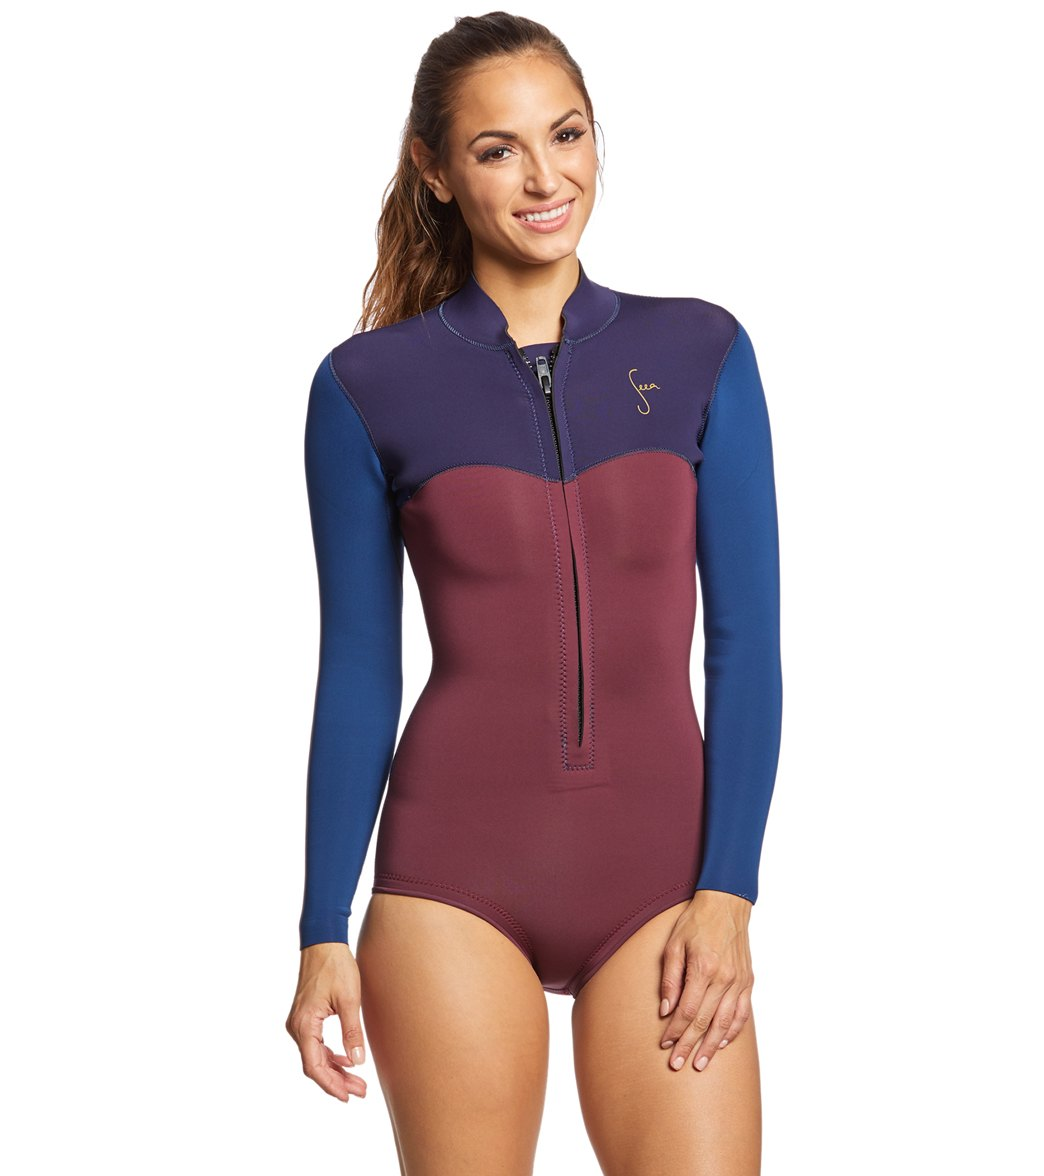 c369f22481c Seea Port Carmel 2mm Yulex Spring Suit at SwimOutlet.com - Free Shipping